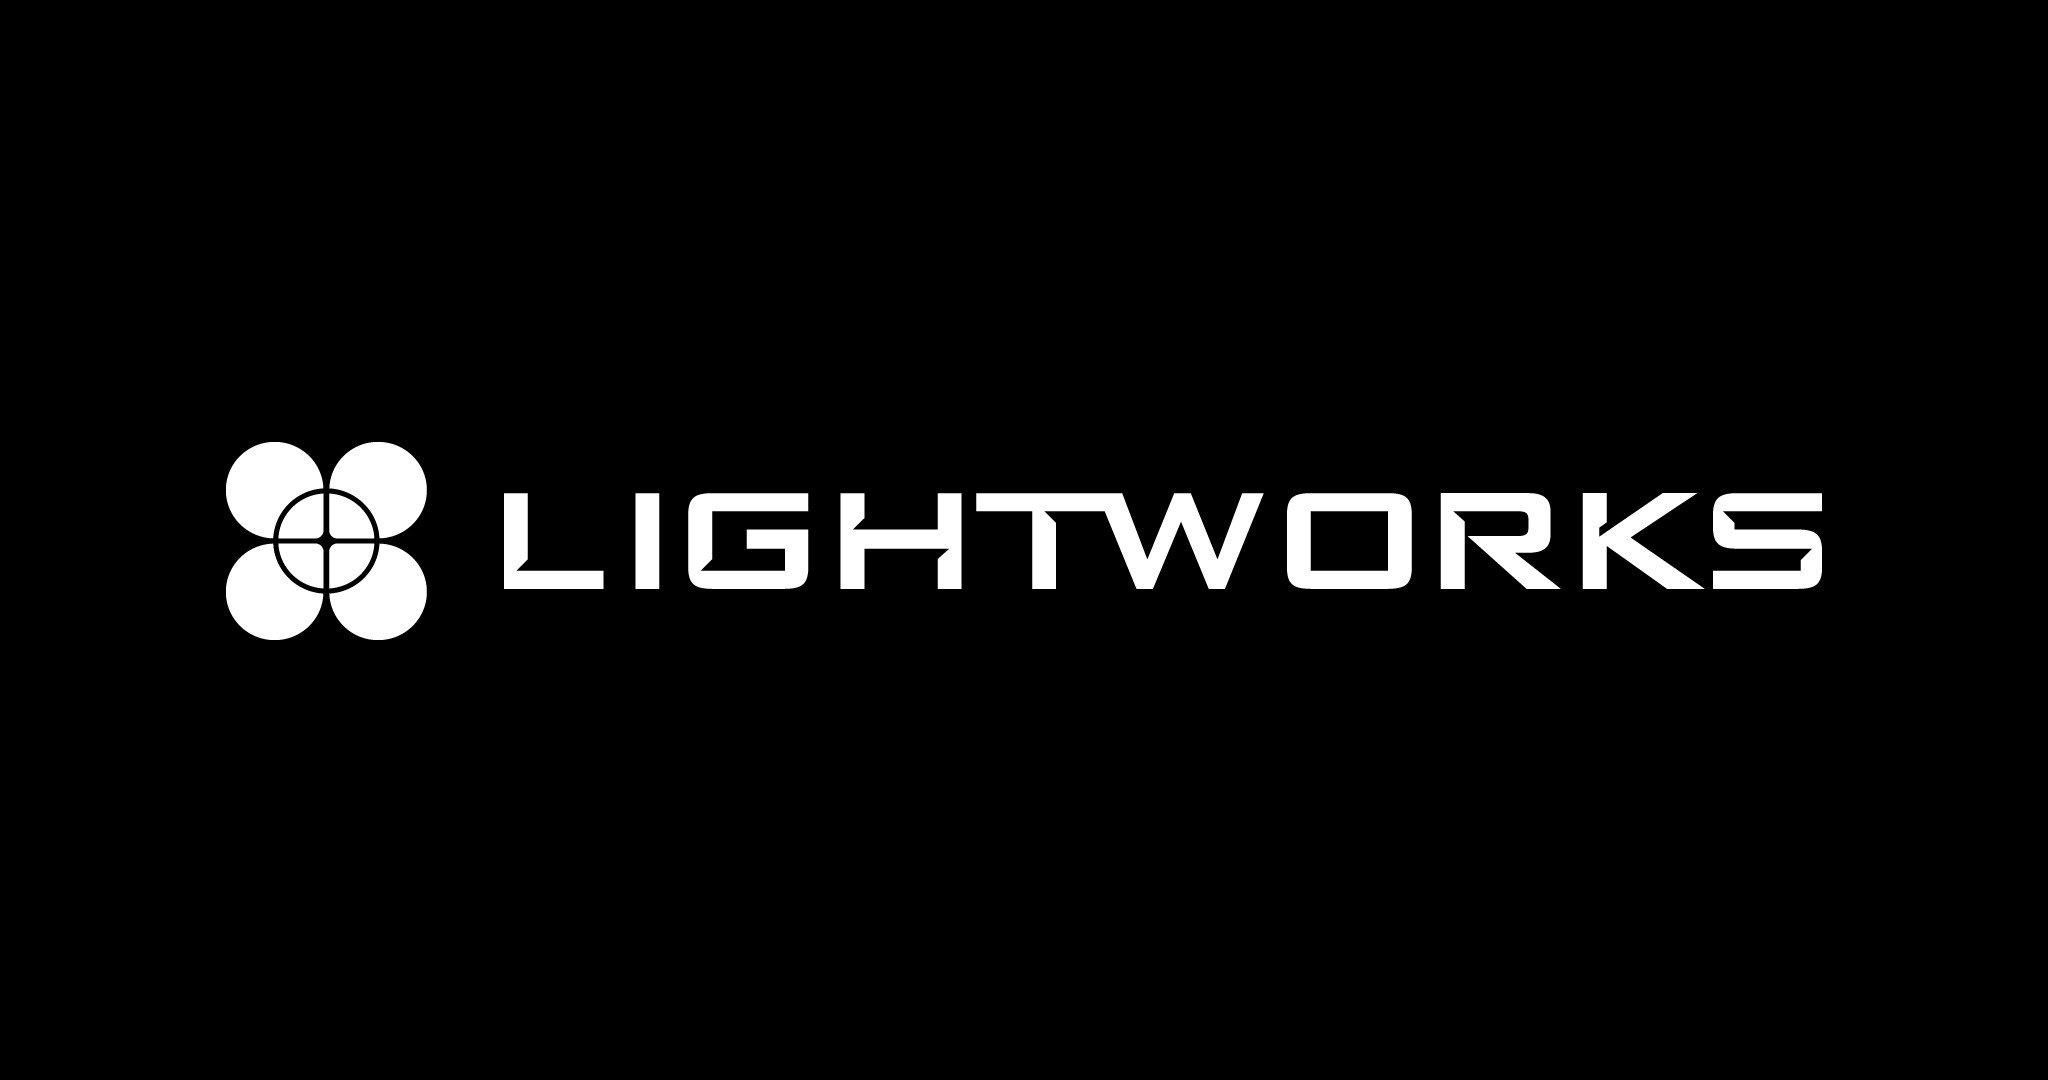 lightwrks